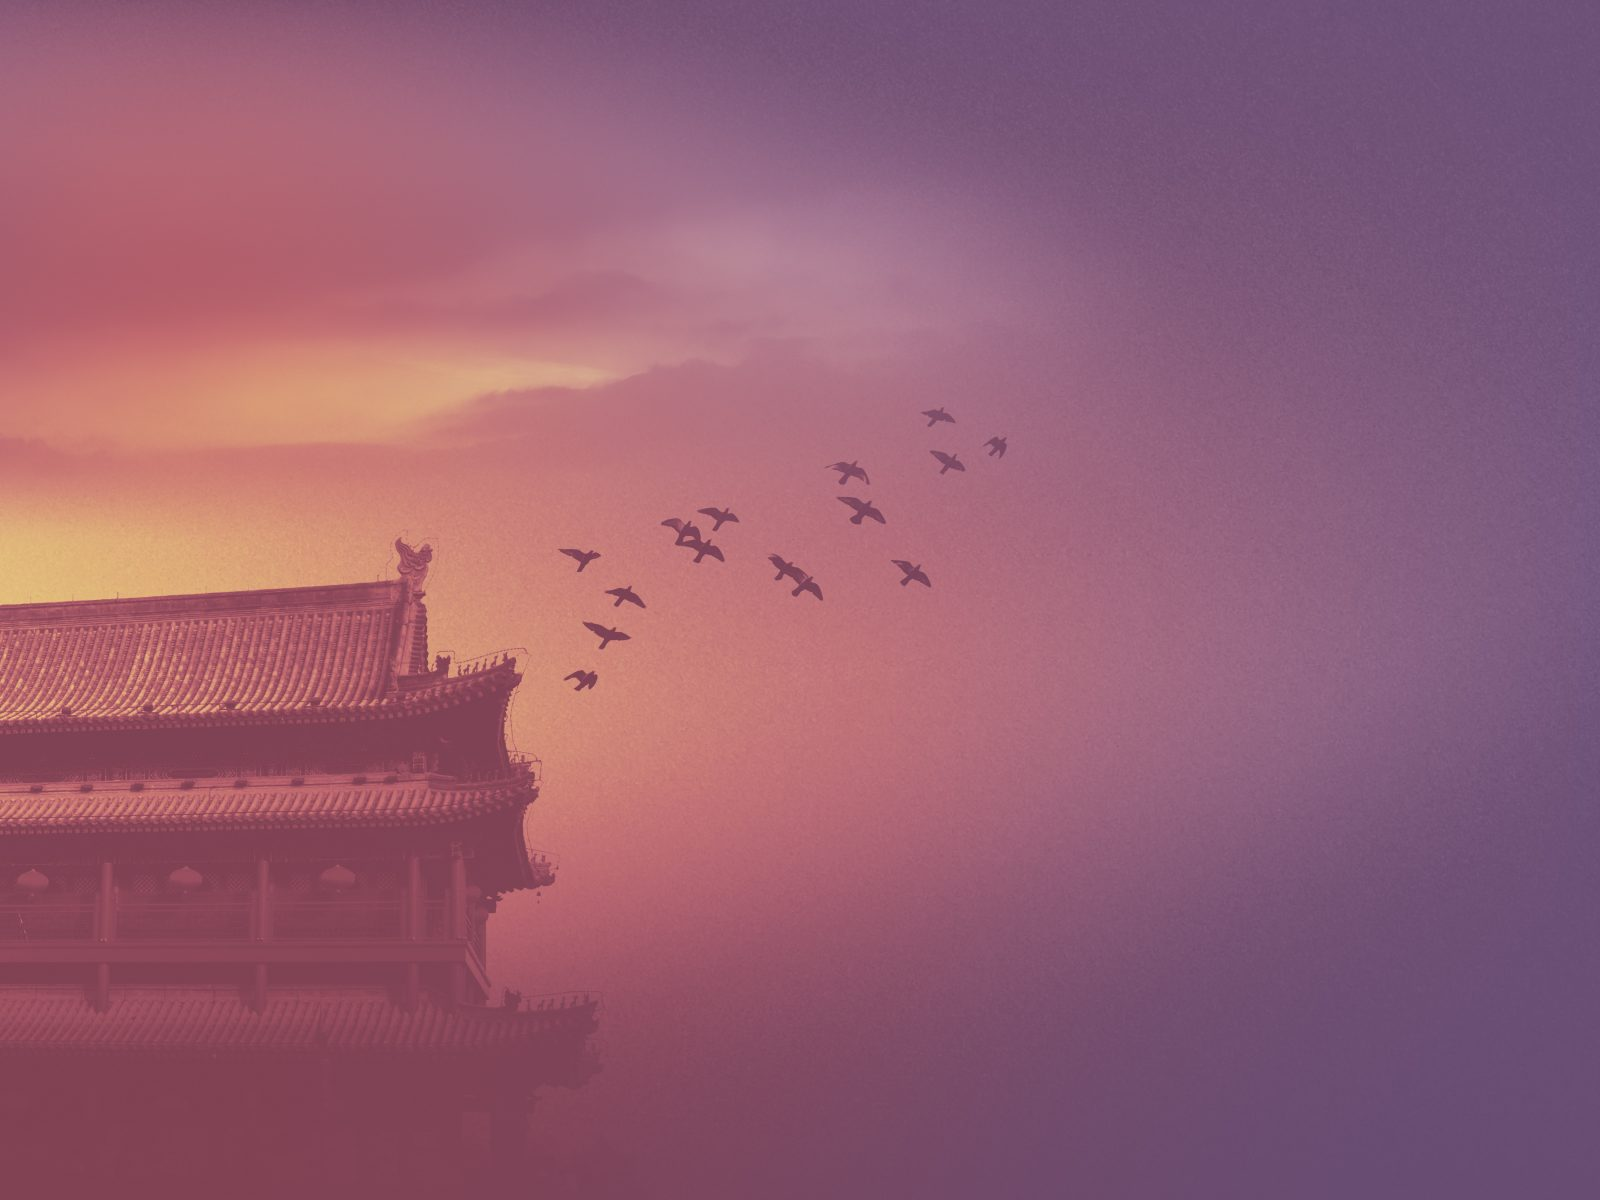 Asian historic building silhouette mystic scene birds